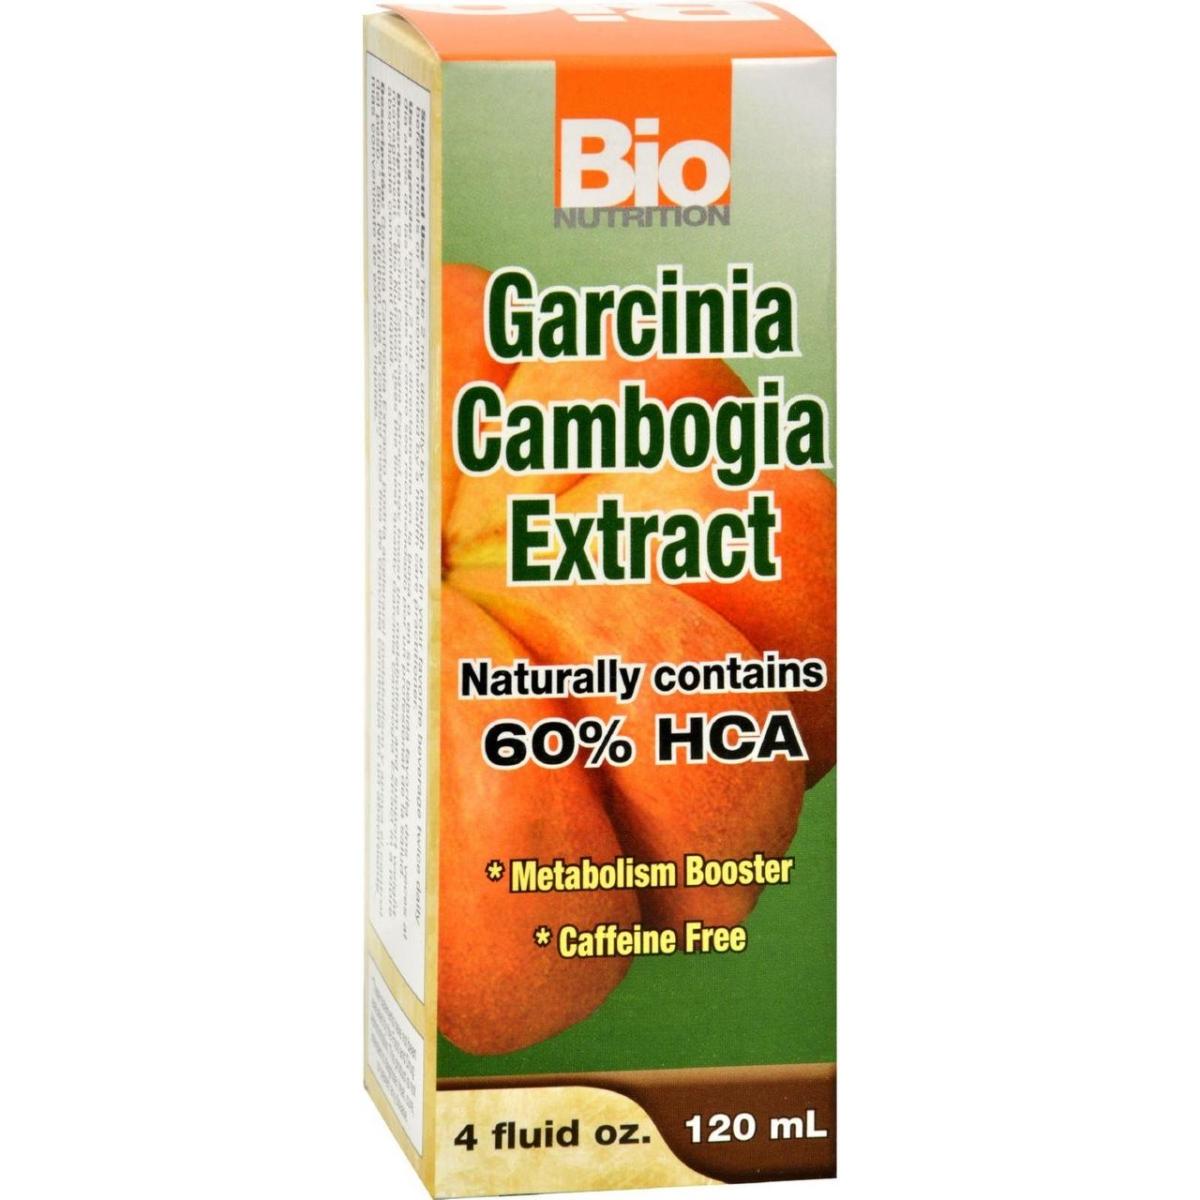 Bio Nutrition HG1267392 4 fl oz Garcinia Cambogia Liquid